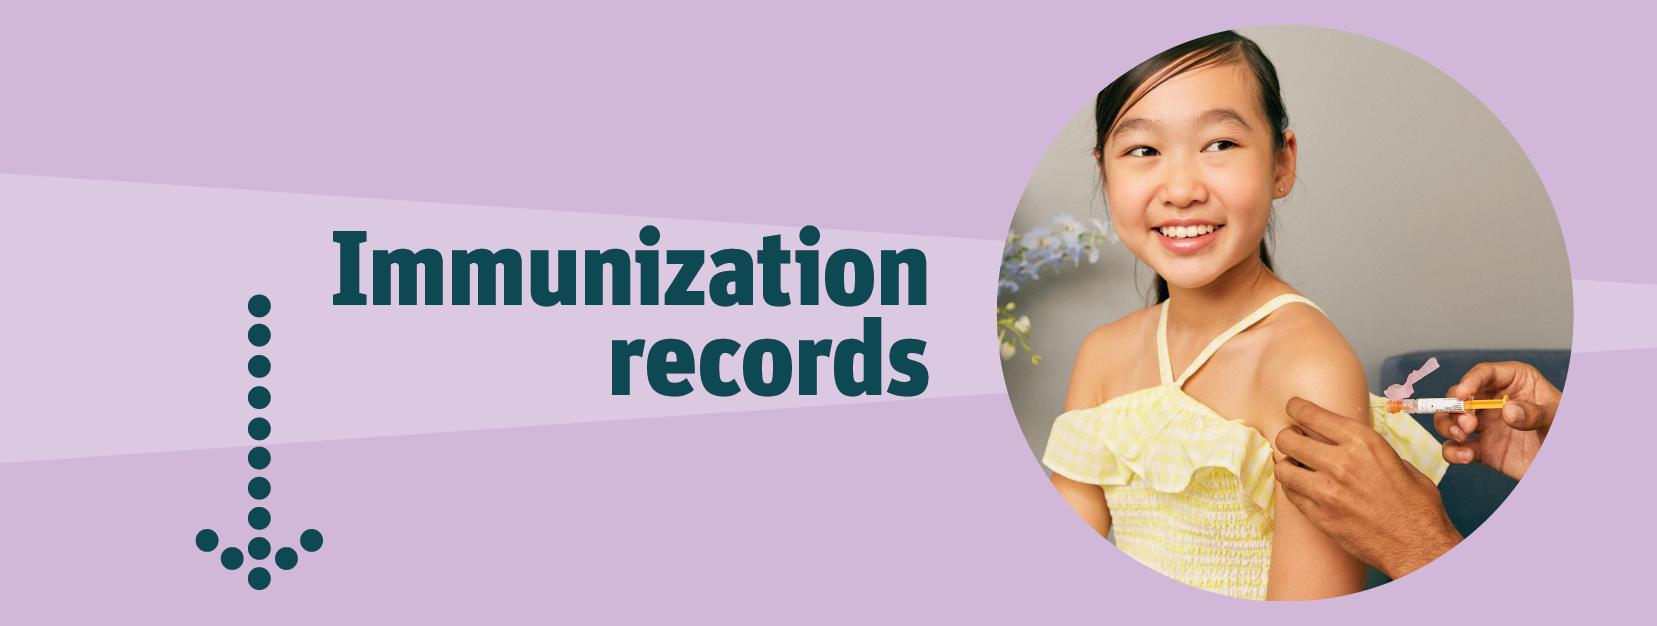 Immunization records